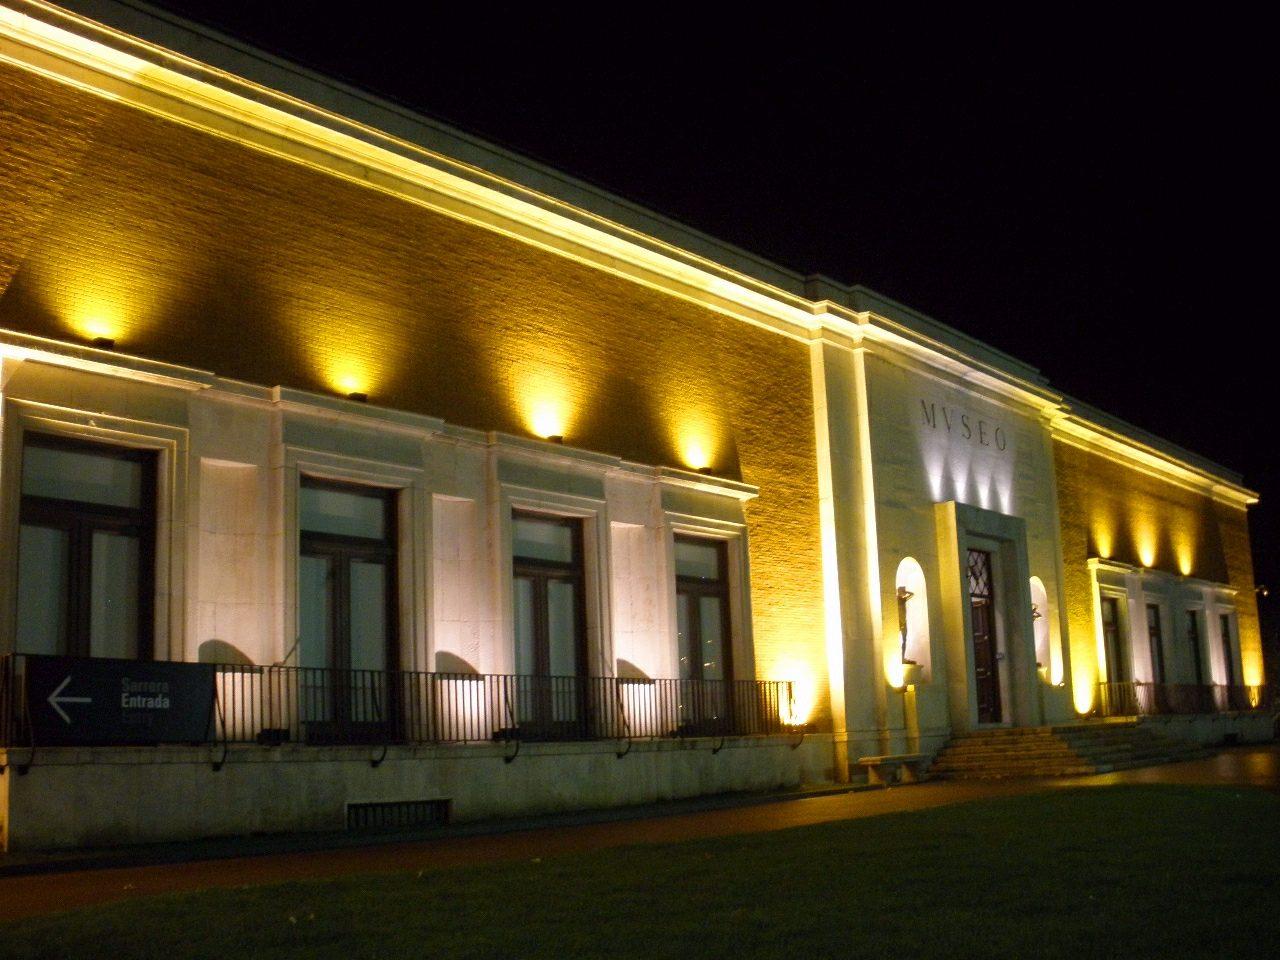 File:Bilbao - Museo de Bellas Artes 03.jpg - Wikimedia Commons